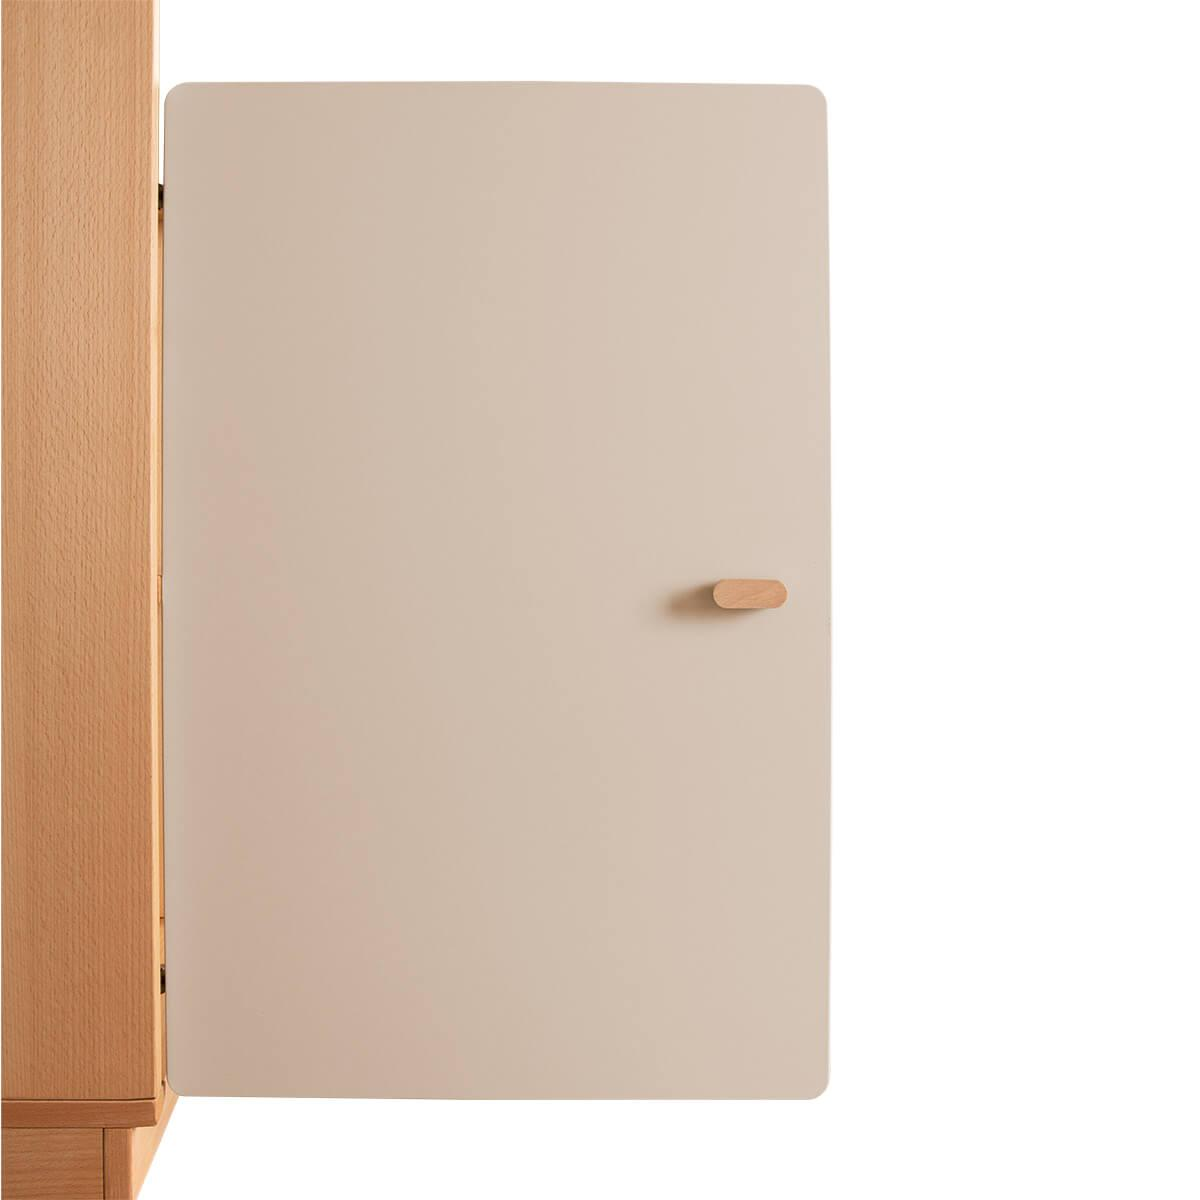 Schranktür 2/5 70cm-Griff DESTYLE Debreuyn  MDF hellgrau-lackiert